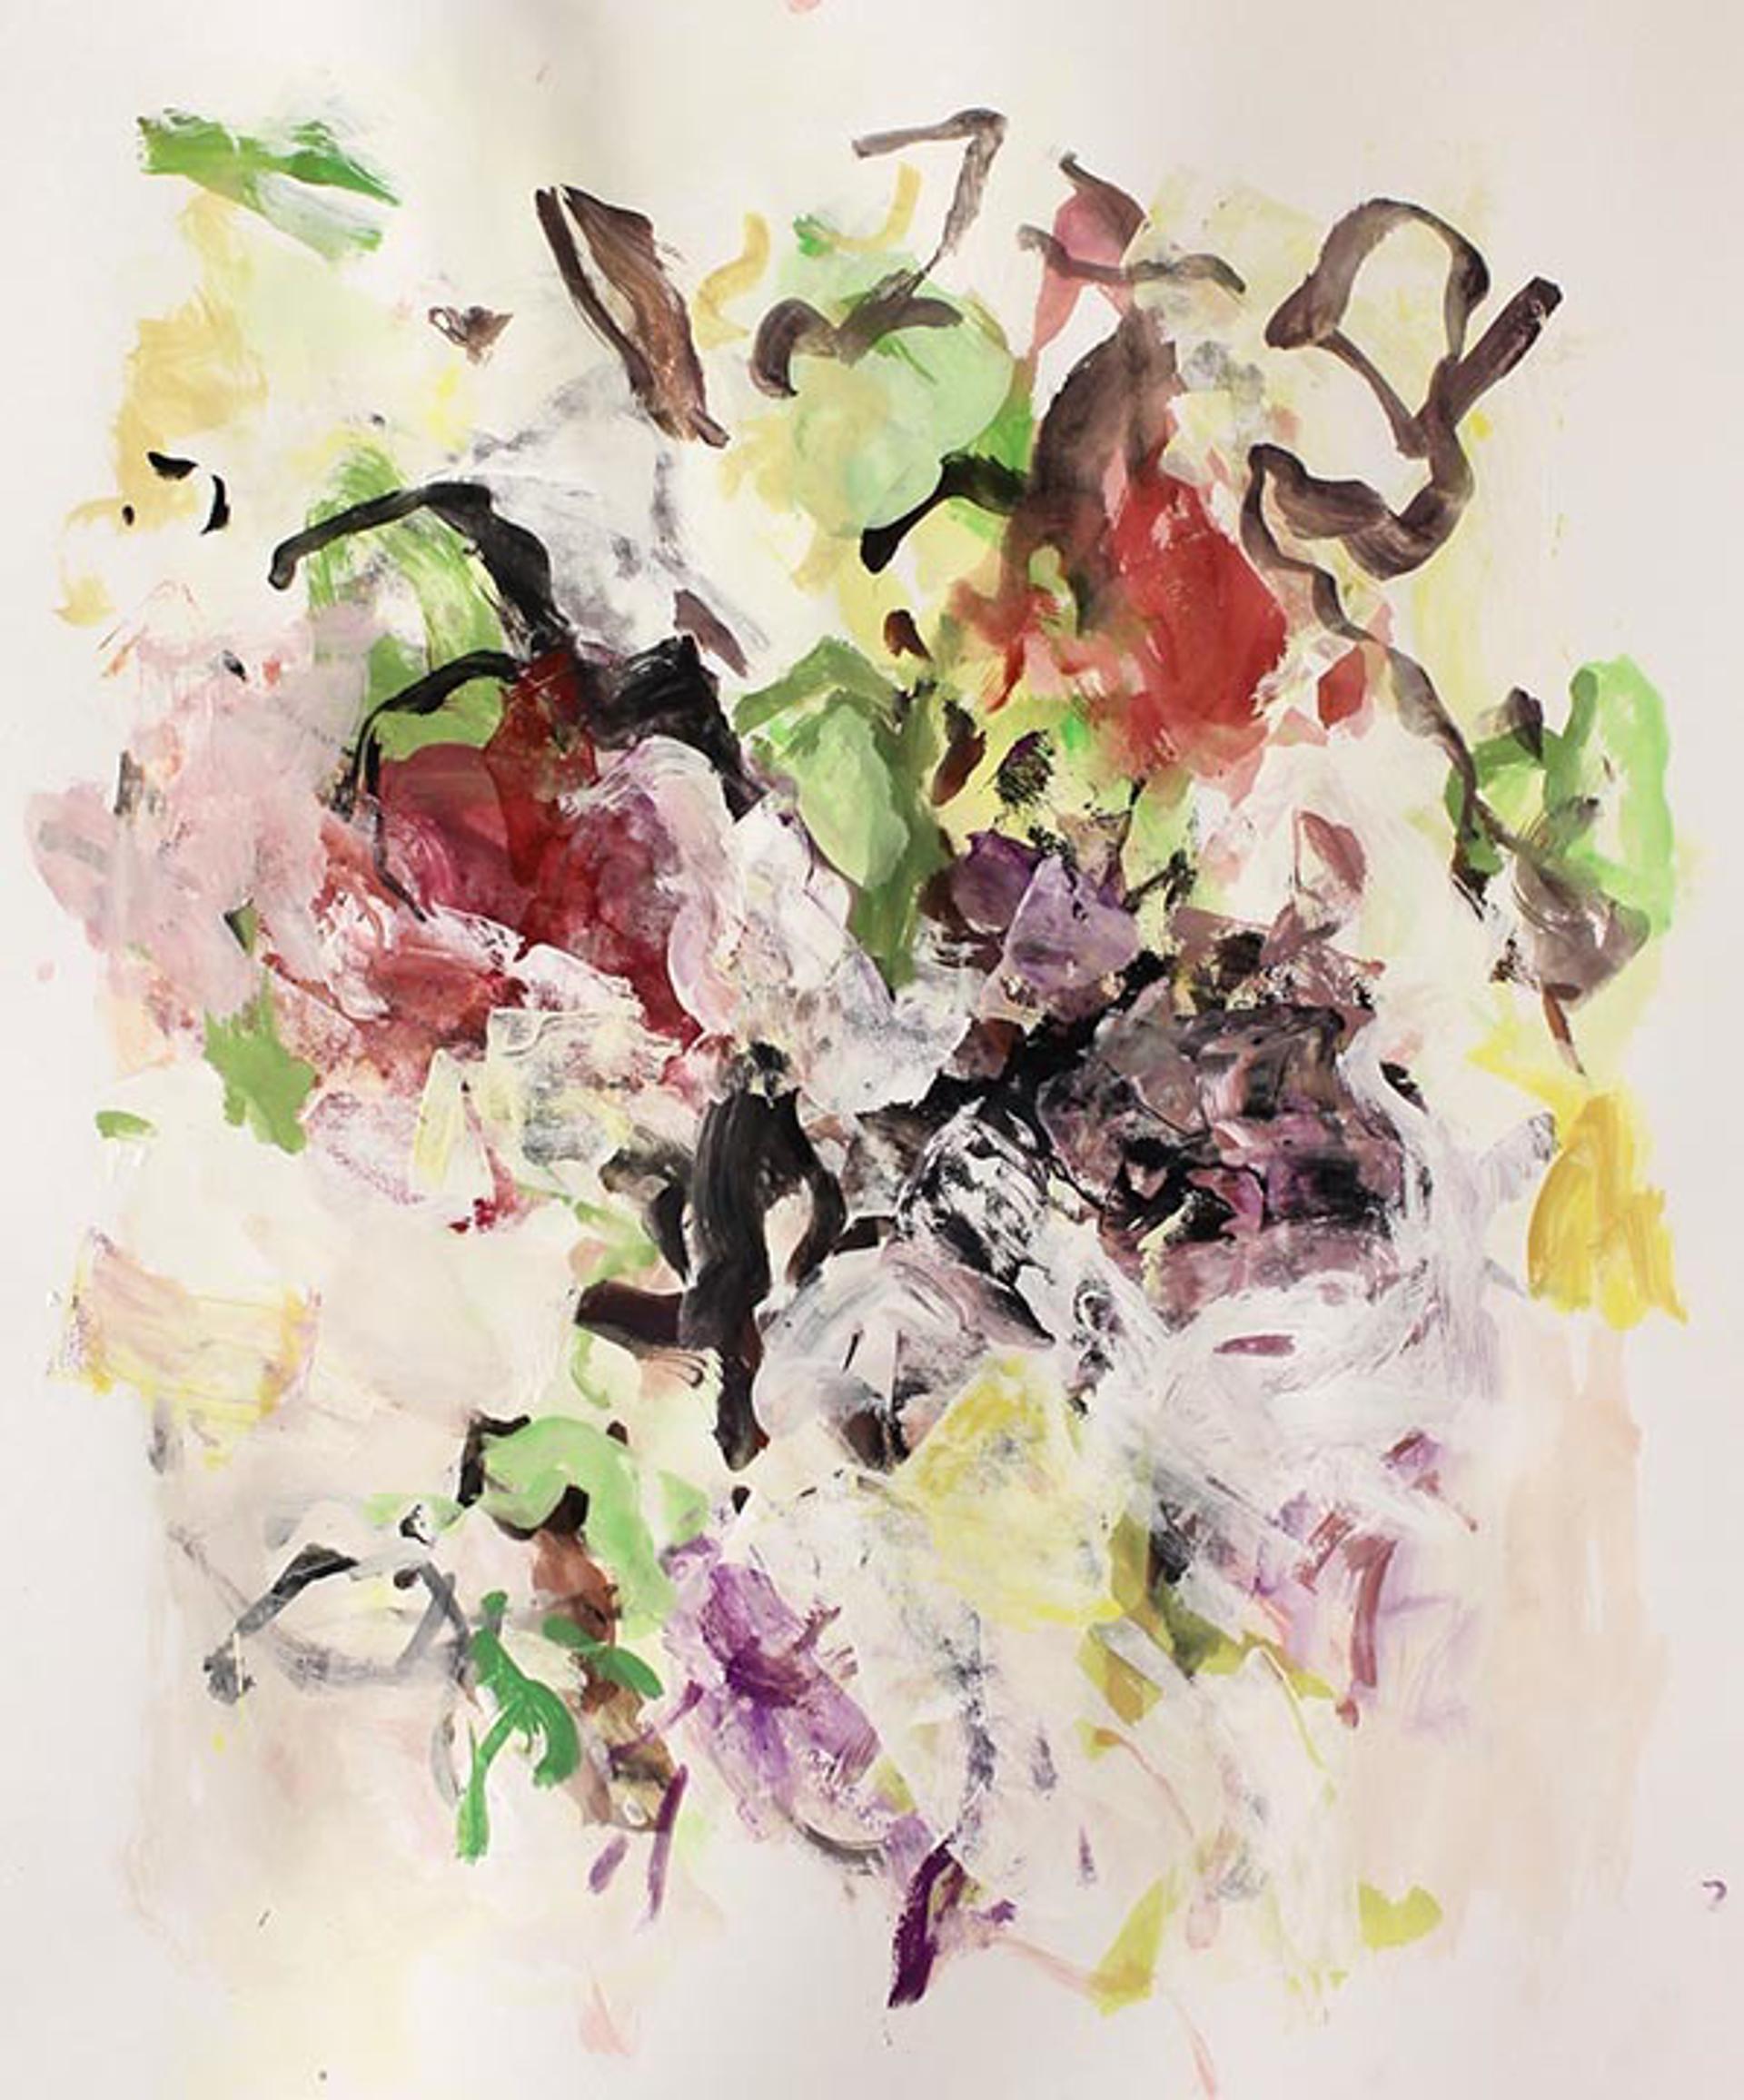 Natural Rhythms 9 by Ryan Cobourn